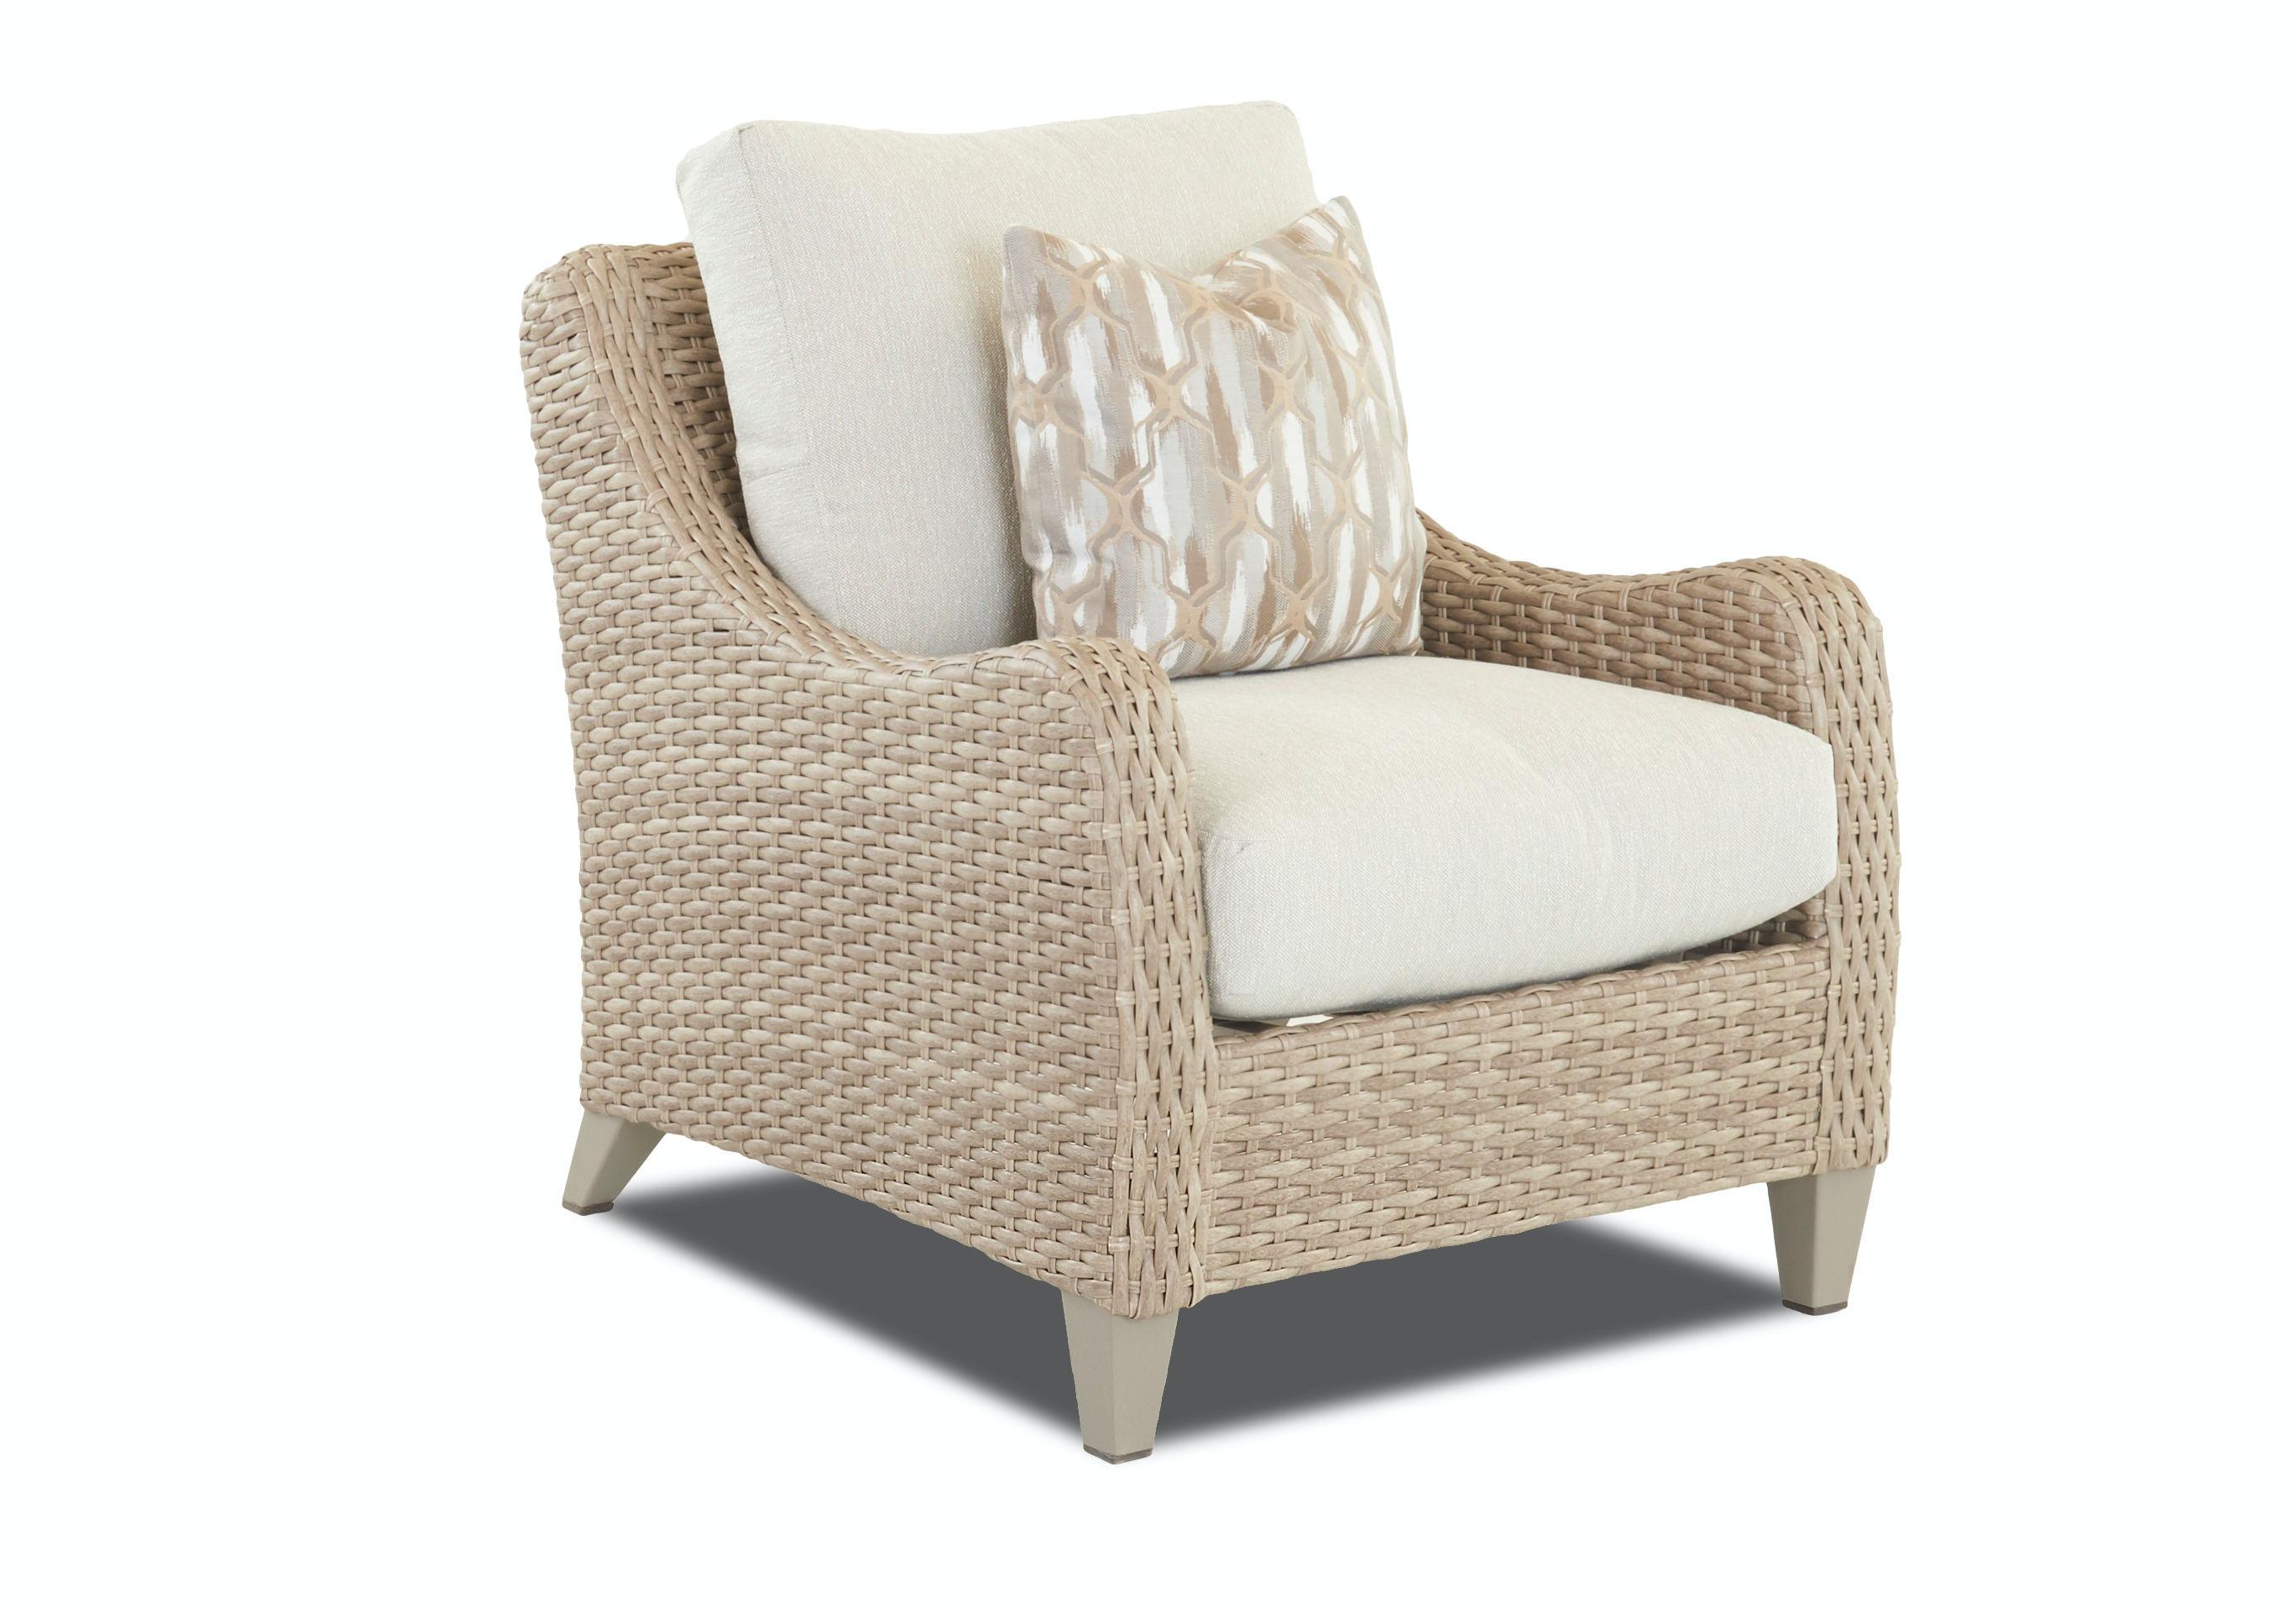 Klaussner Outdoor Mesa Chair W7501 C